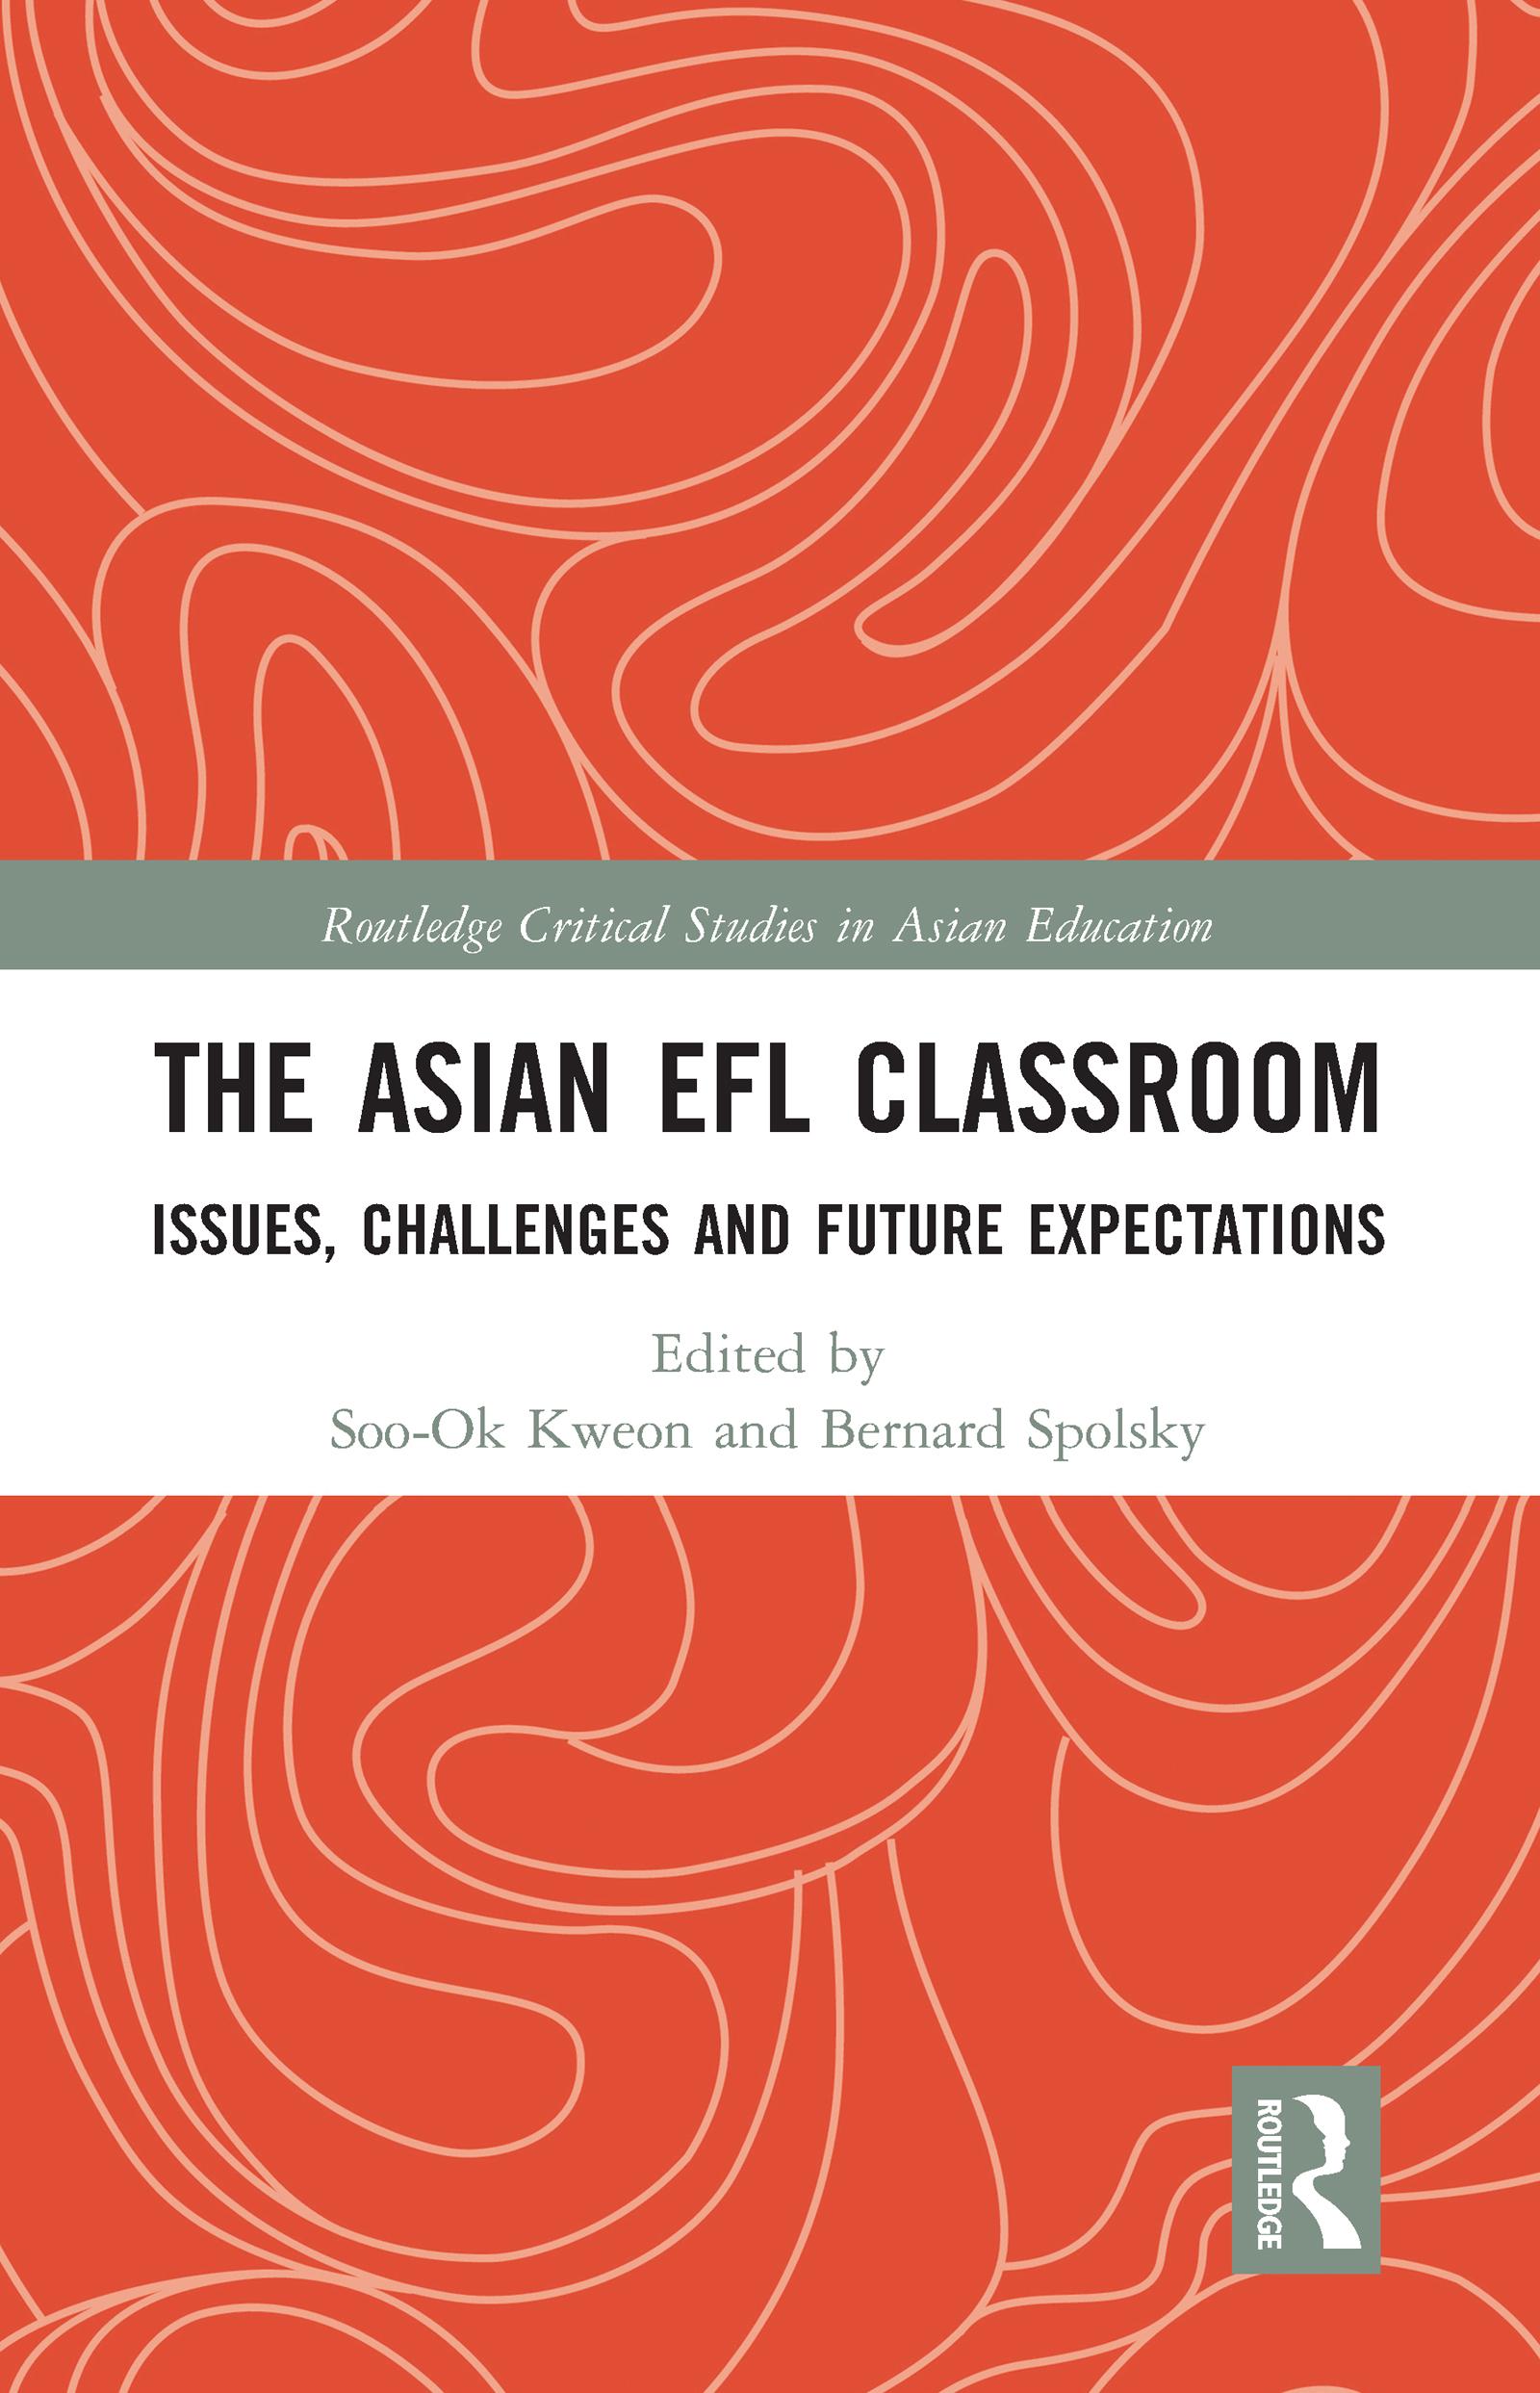 The Asian EFL Classroom